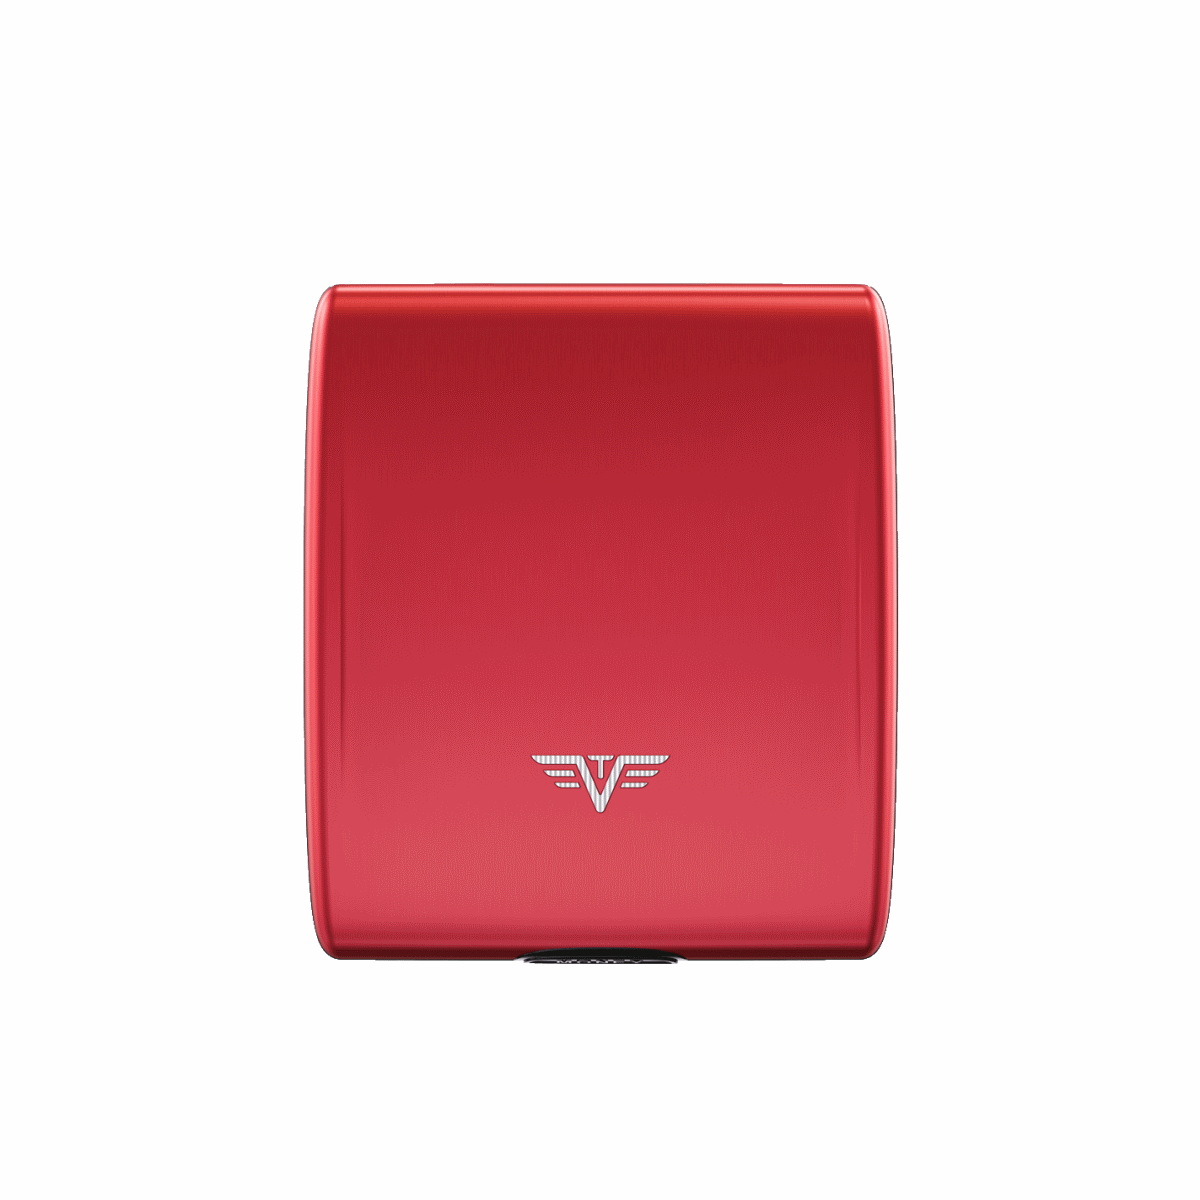 TRU VIRTU ארנק אלומיניום דגם Beluga - אדום